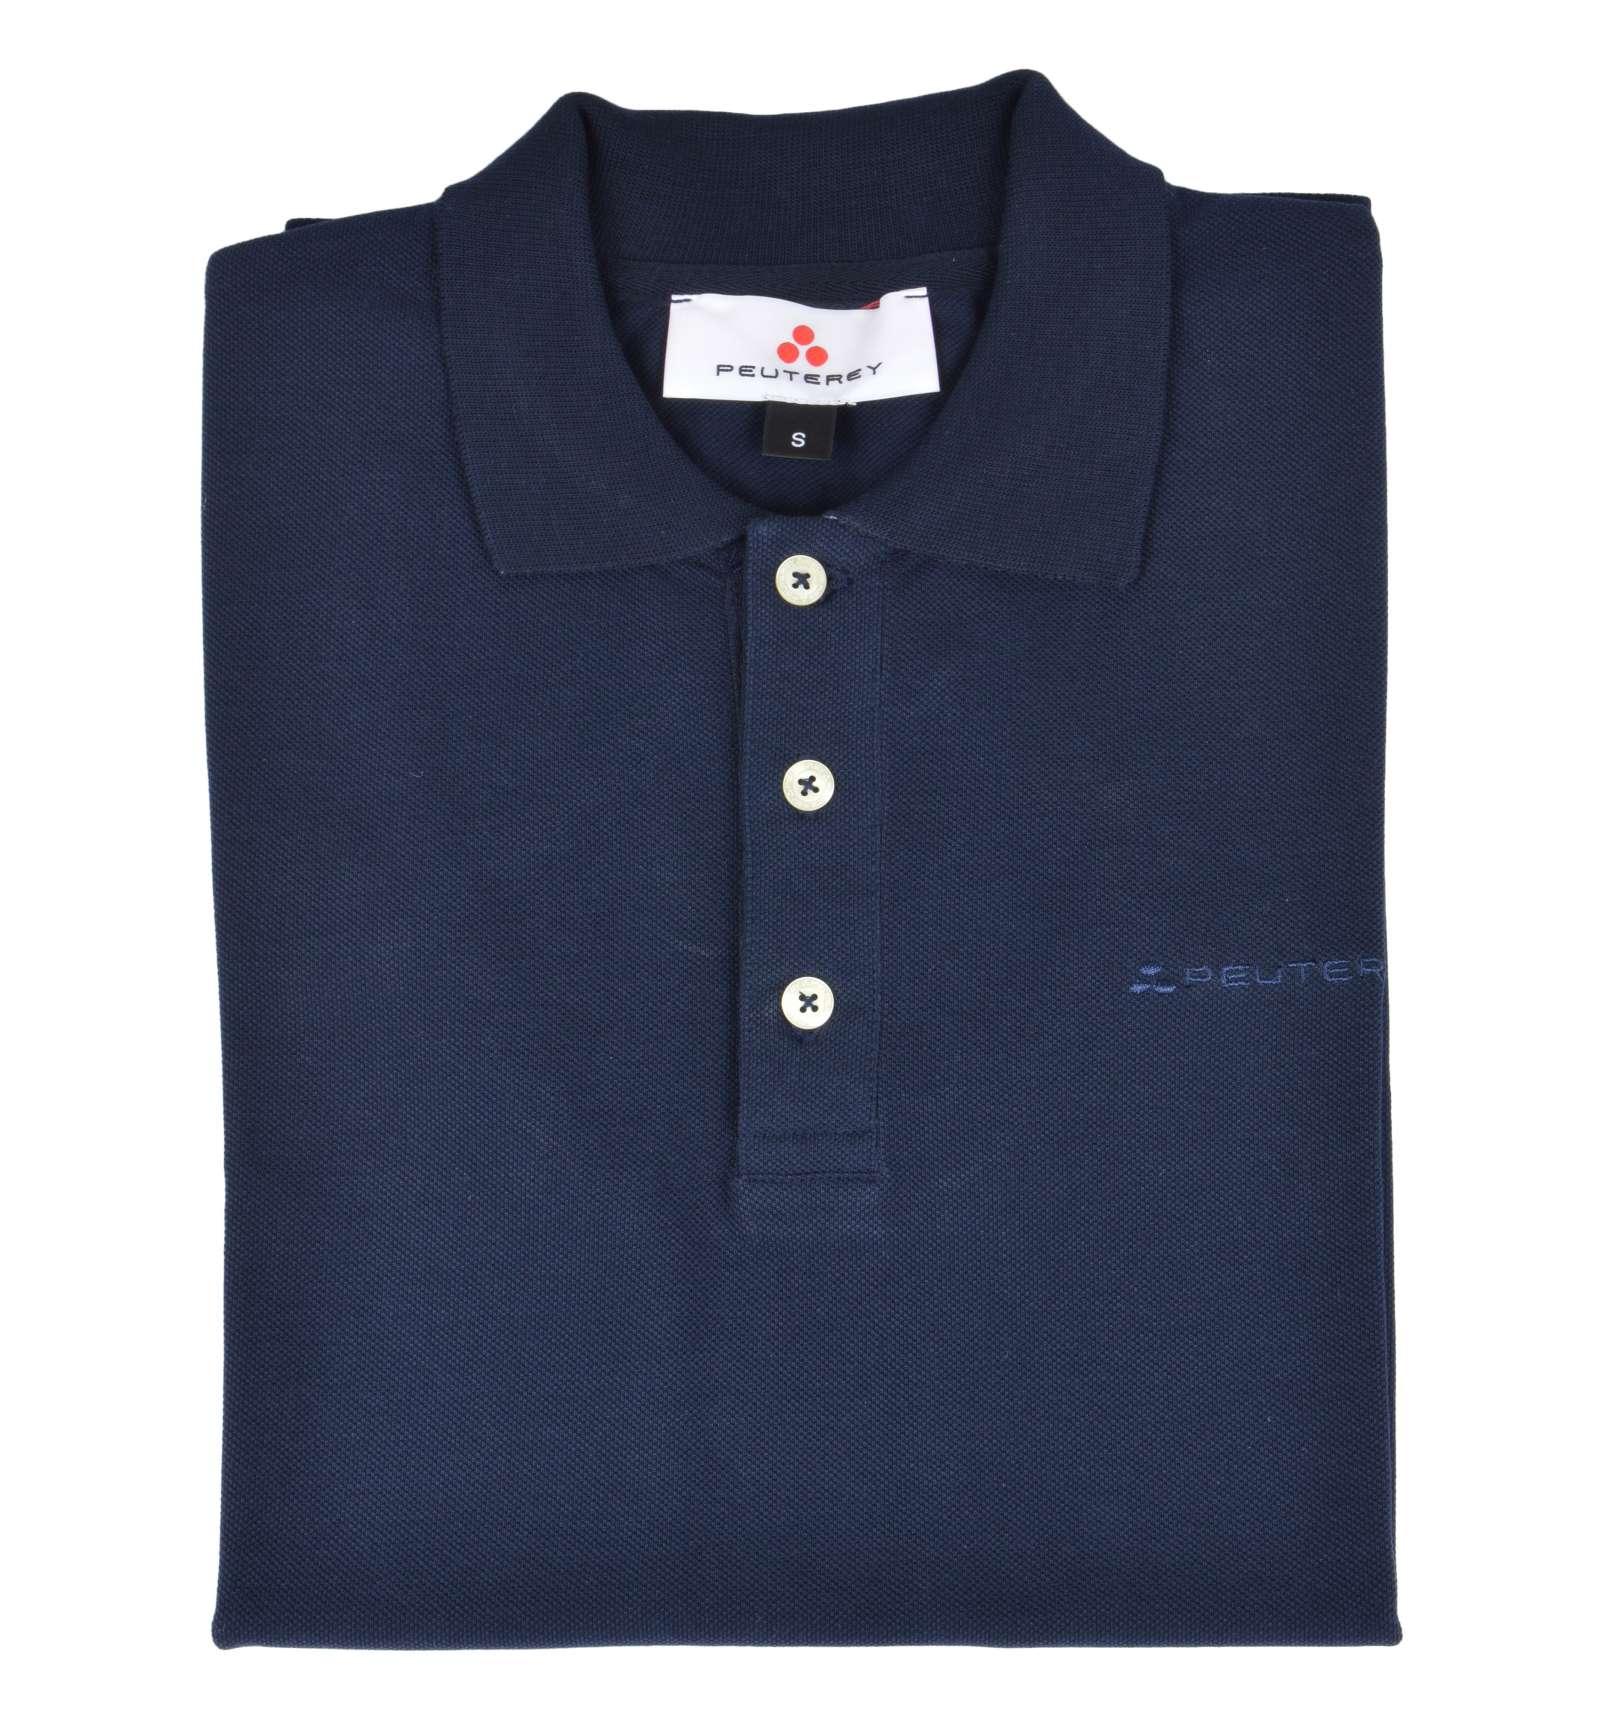 new product 7458f 4ee07 PEUTEREY uomo maglia polo blu scuro manica corta CALEDONIAN14 TIES 215